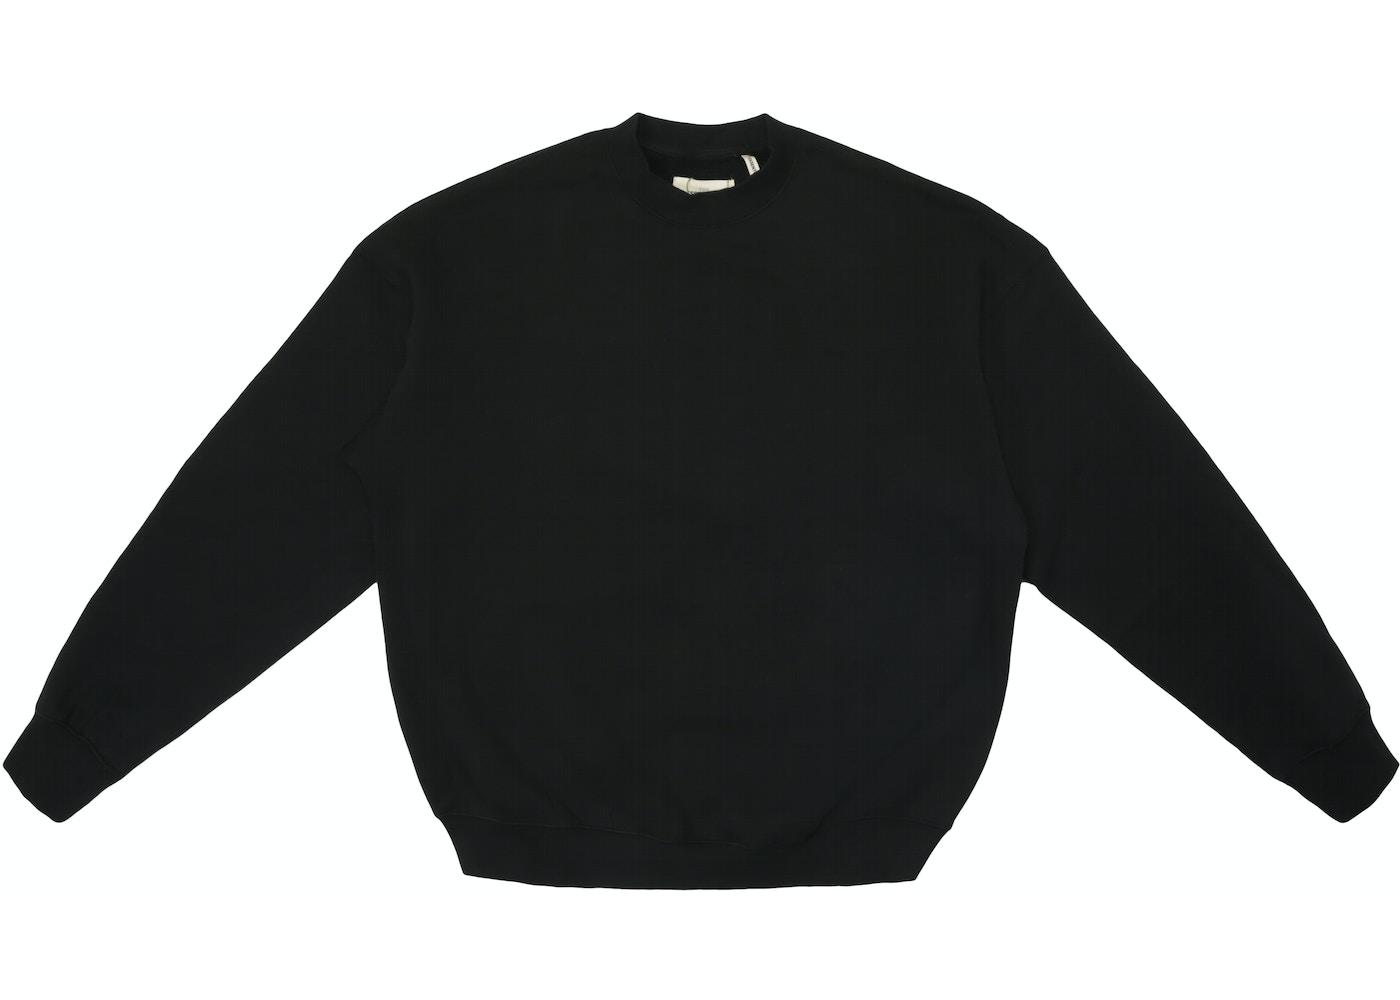 9586e7b88 FEAR OF GOD Essentials Crew Neck Sweatshirt Black